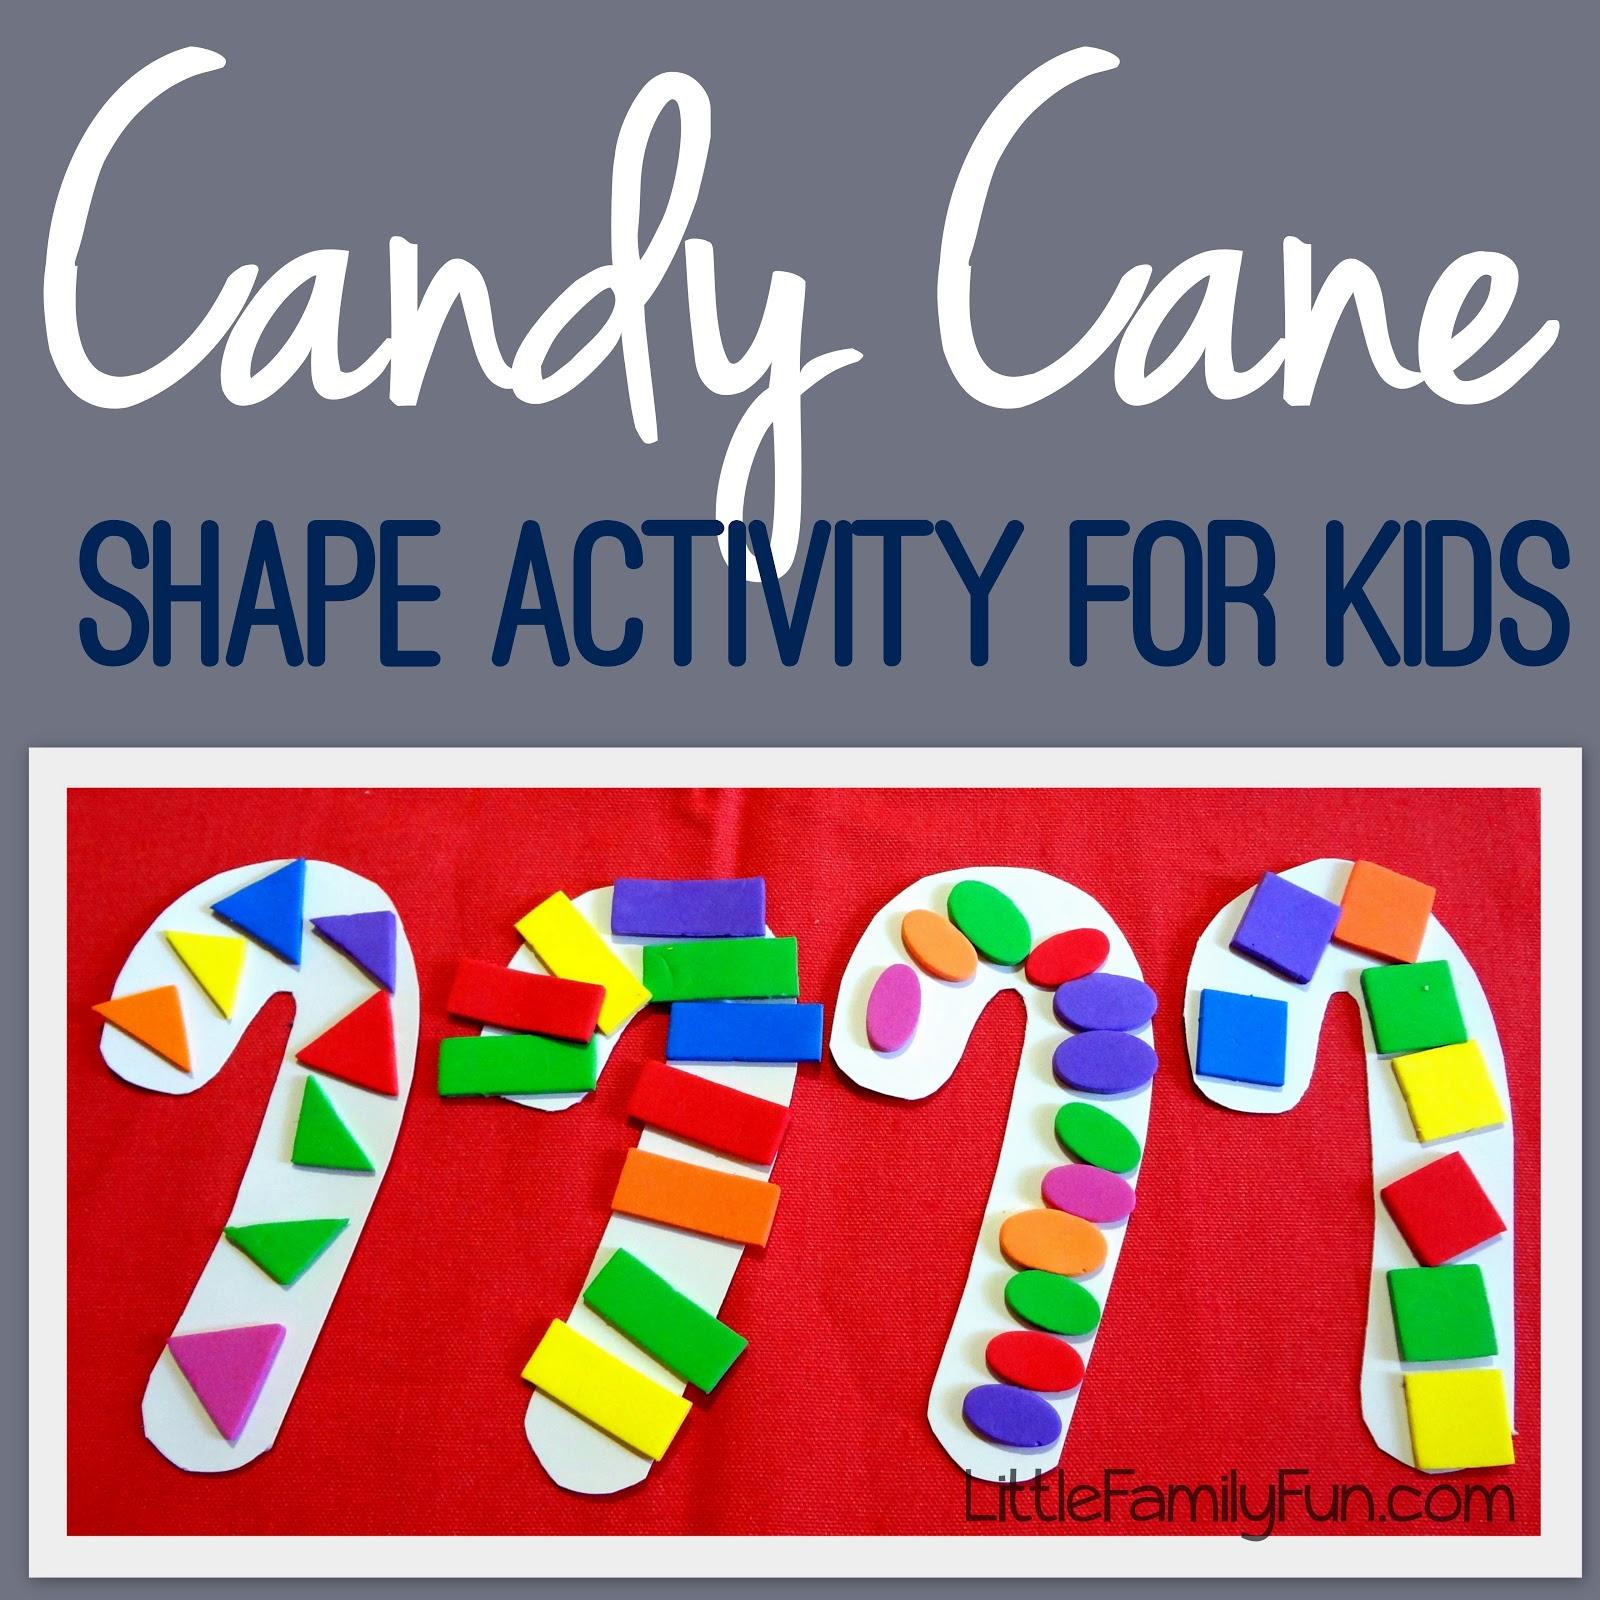 Candy Cane Shape Activity